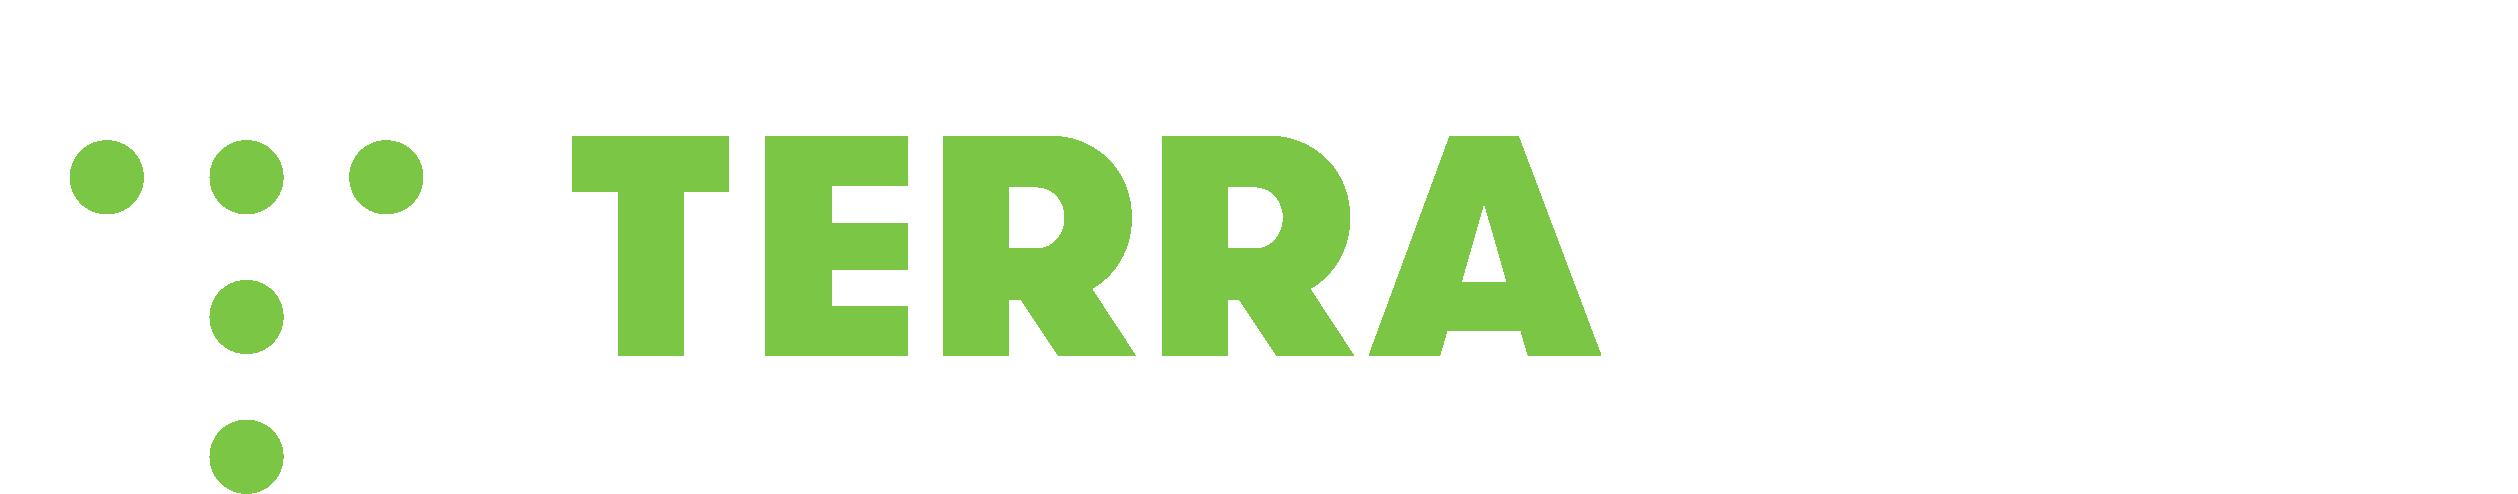 TerraWatt. Clean Energy. Make new friends. Connect….